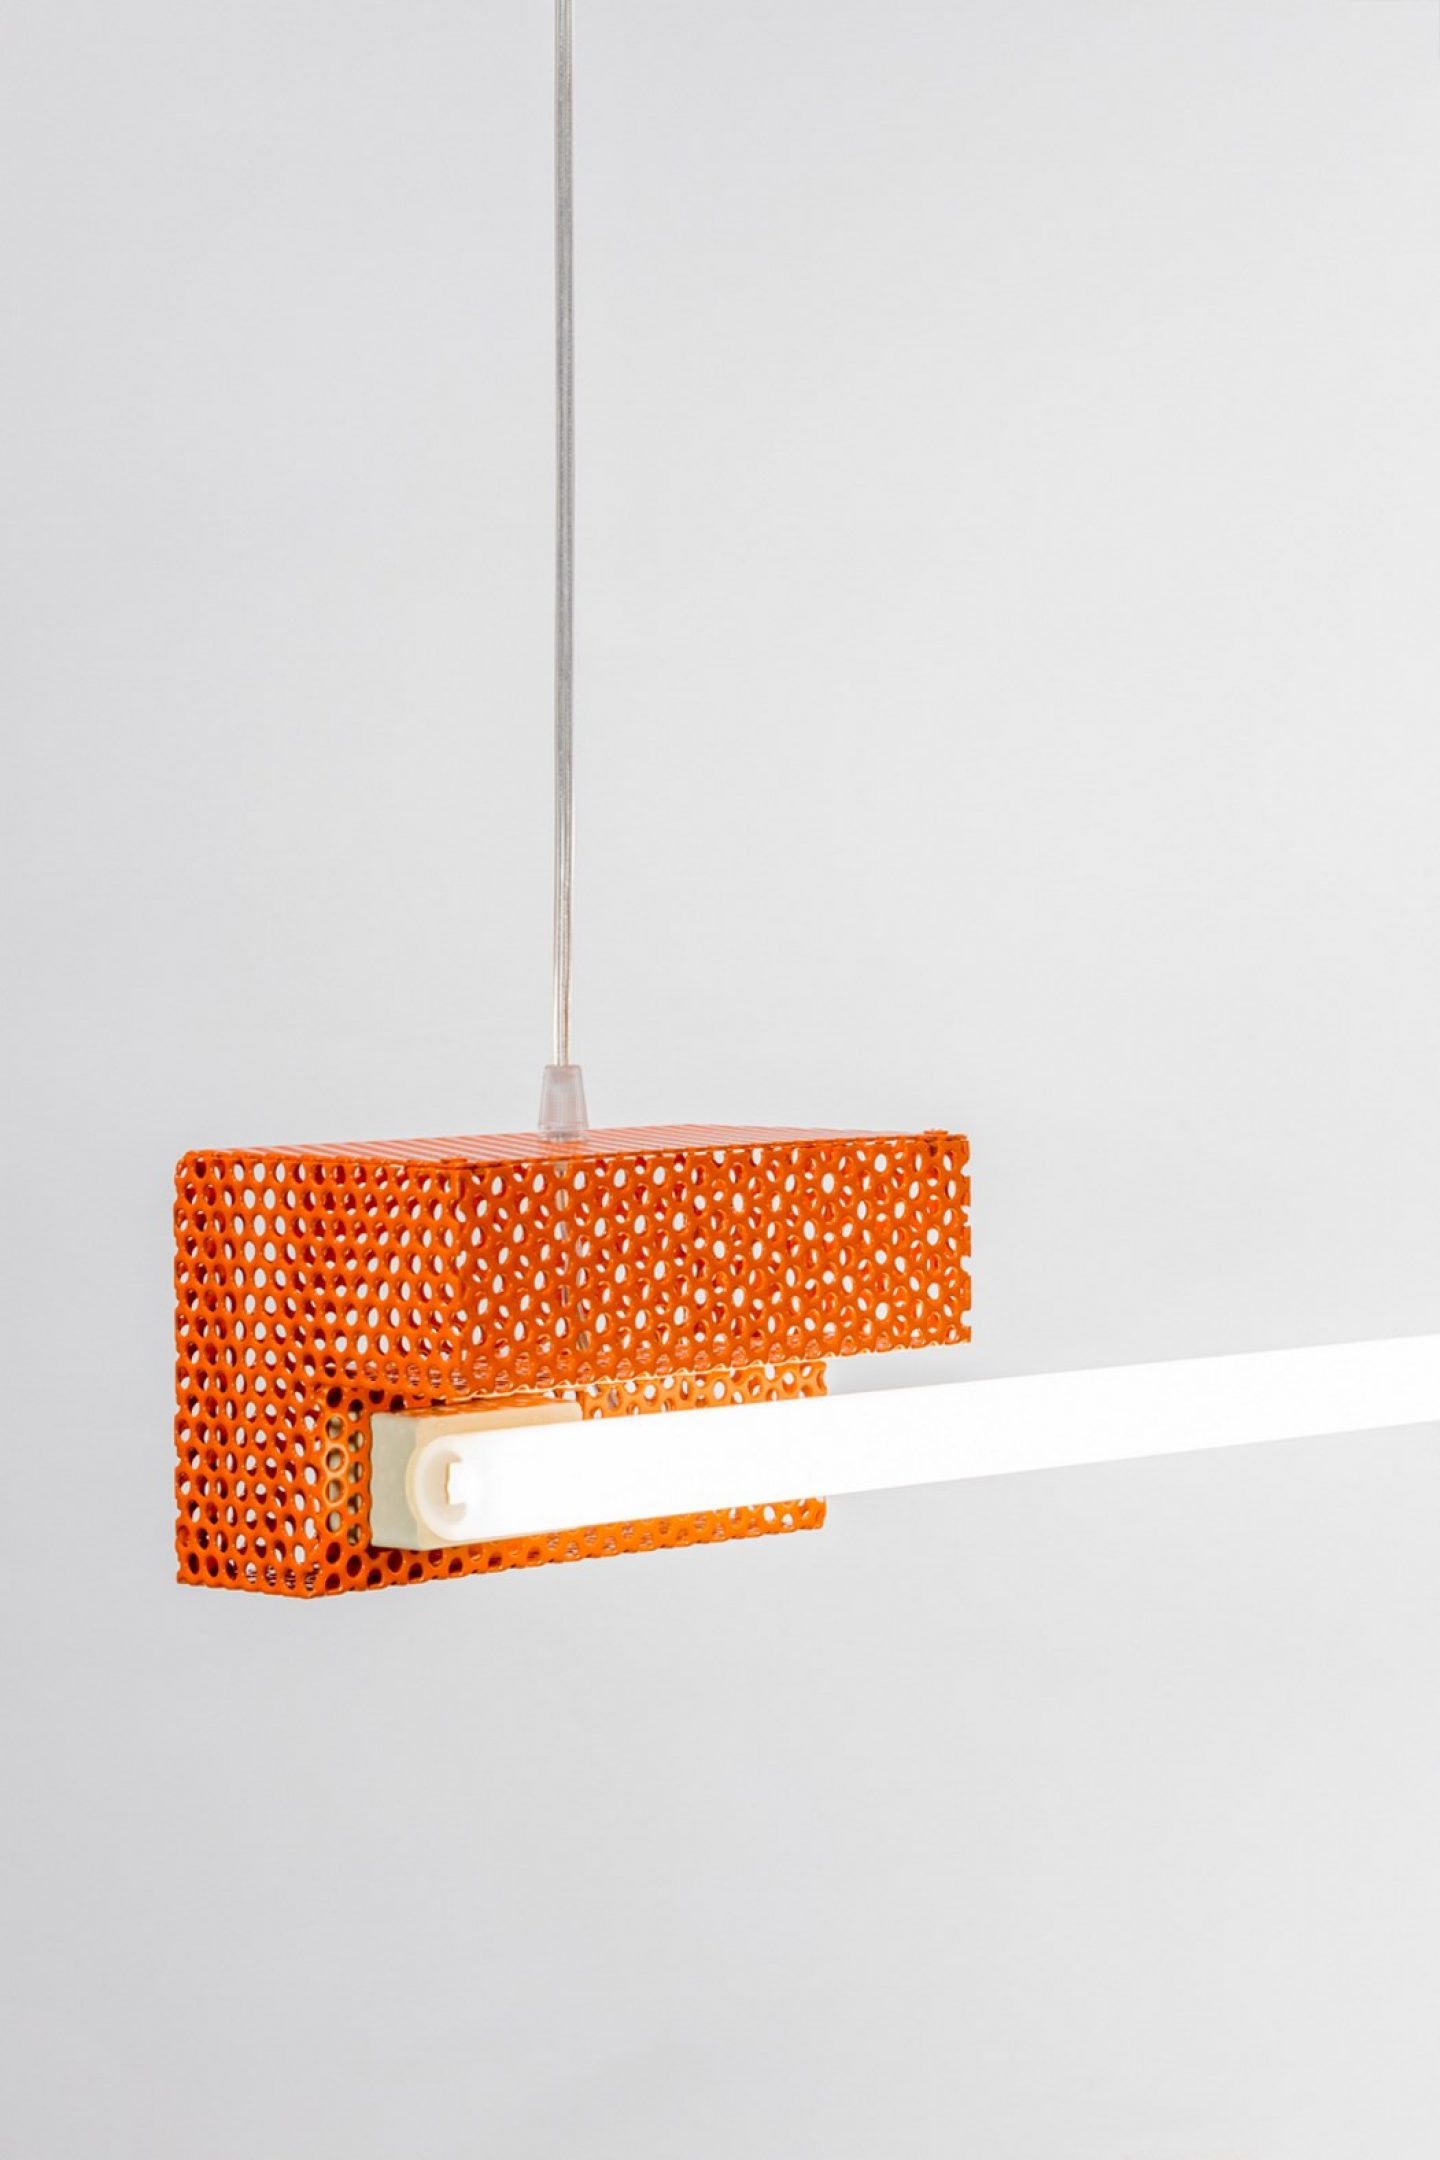 Marta_Ayla_Design (10)